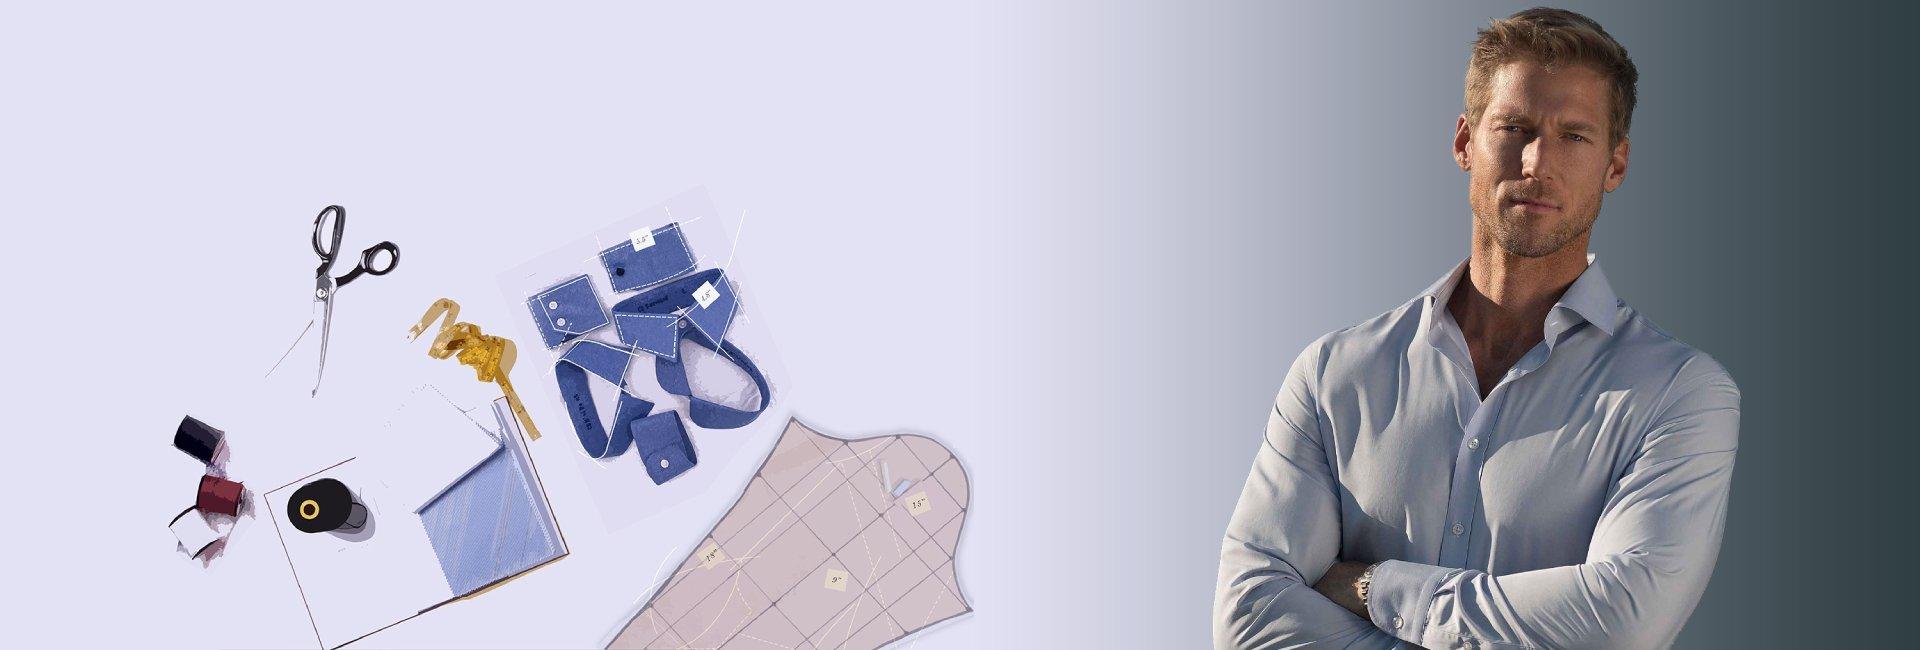 Custom Dress Shirts with tailoring tools